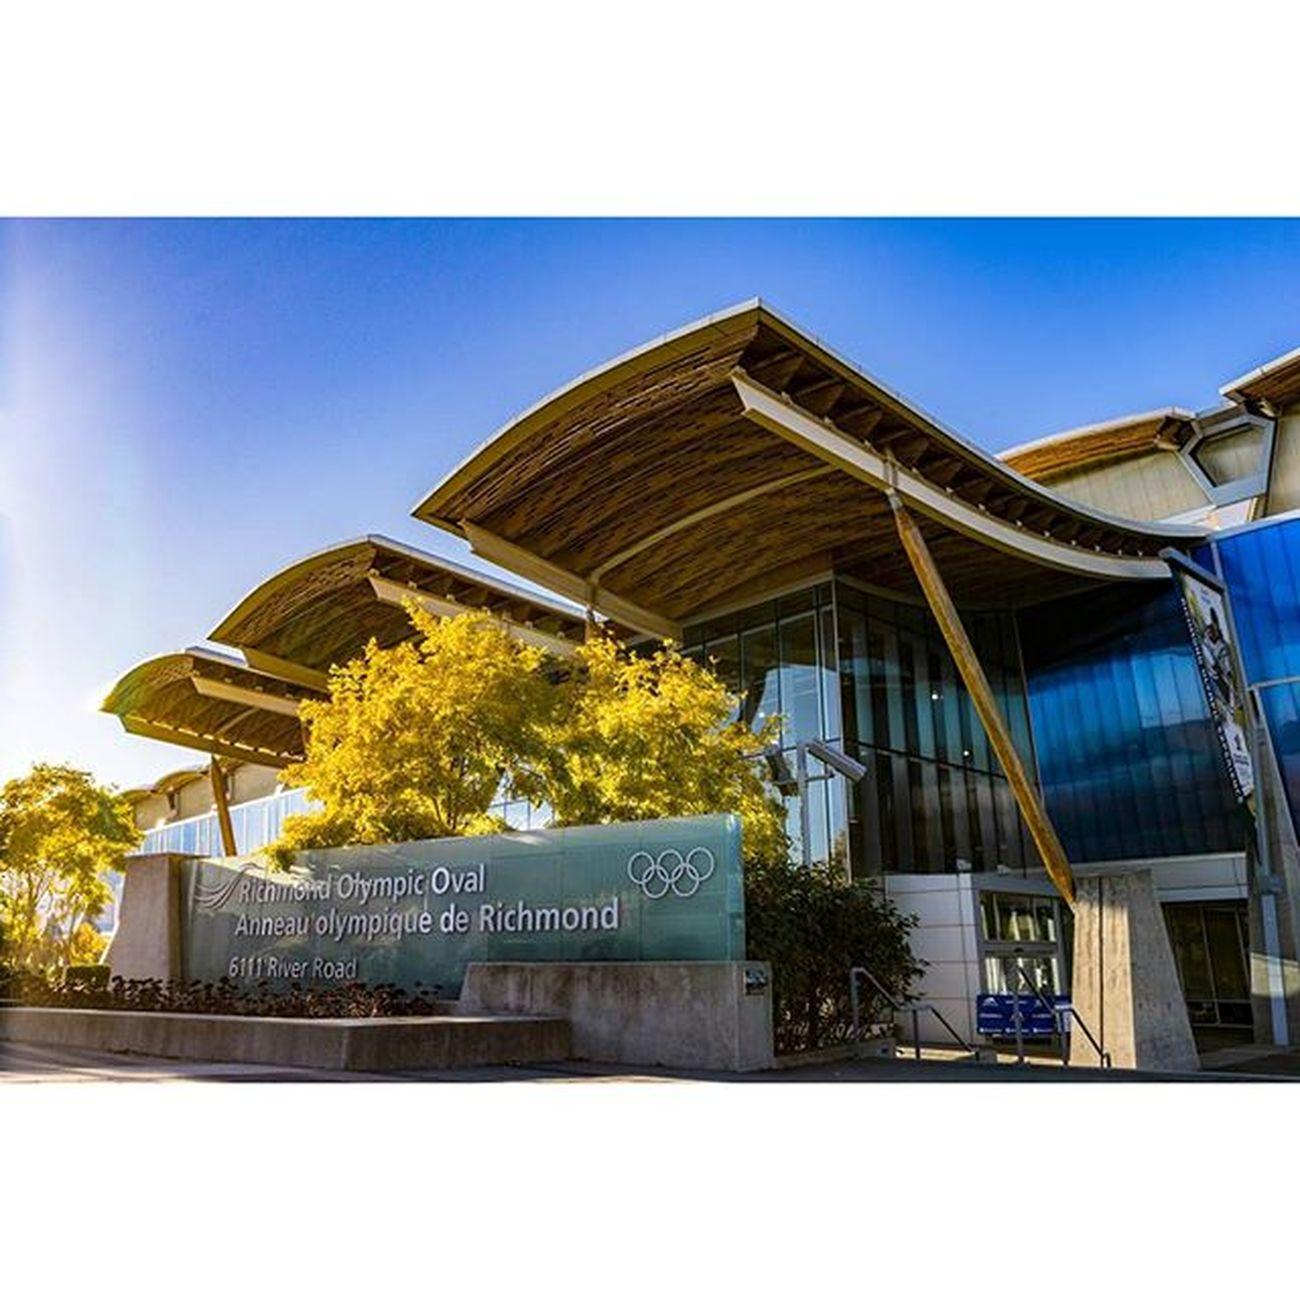 Home away from home. Oval Richmondoval Richmondolympicoval Richmond vancitybuzz vancouver gym landscape photography